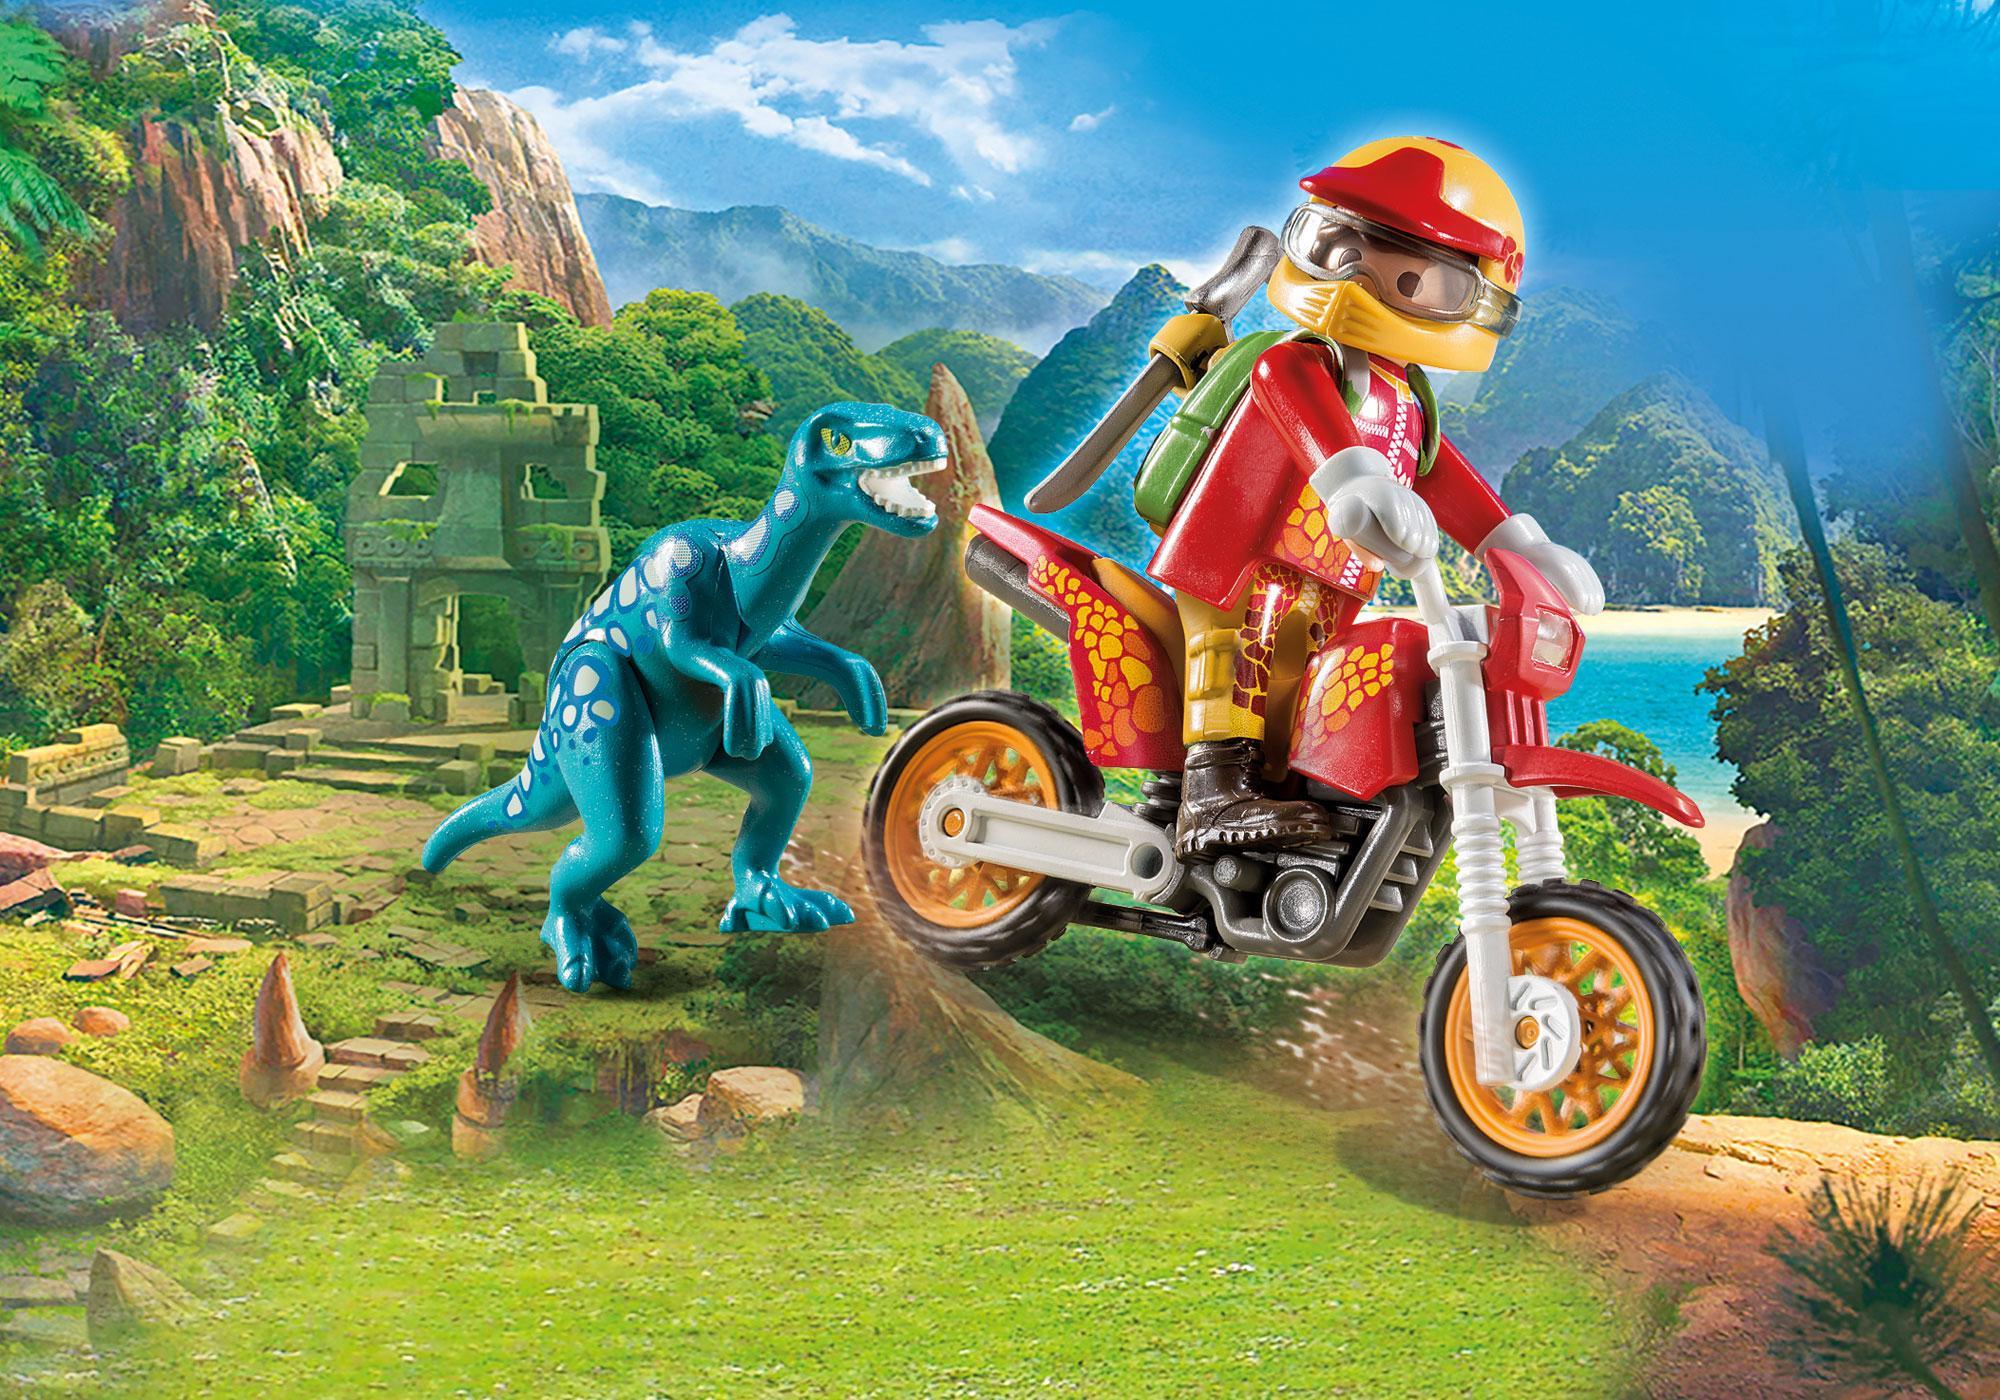 http://media.playmobil.com/i/playmobil/9431_product_detail/Motocross-Bike mit Raptor